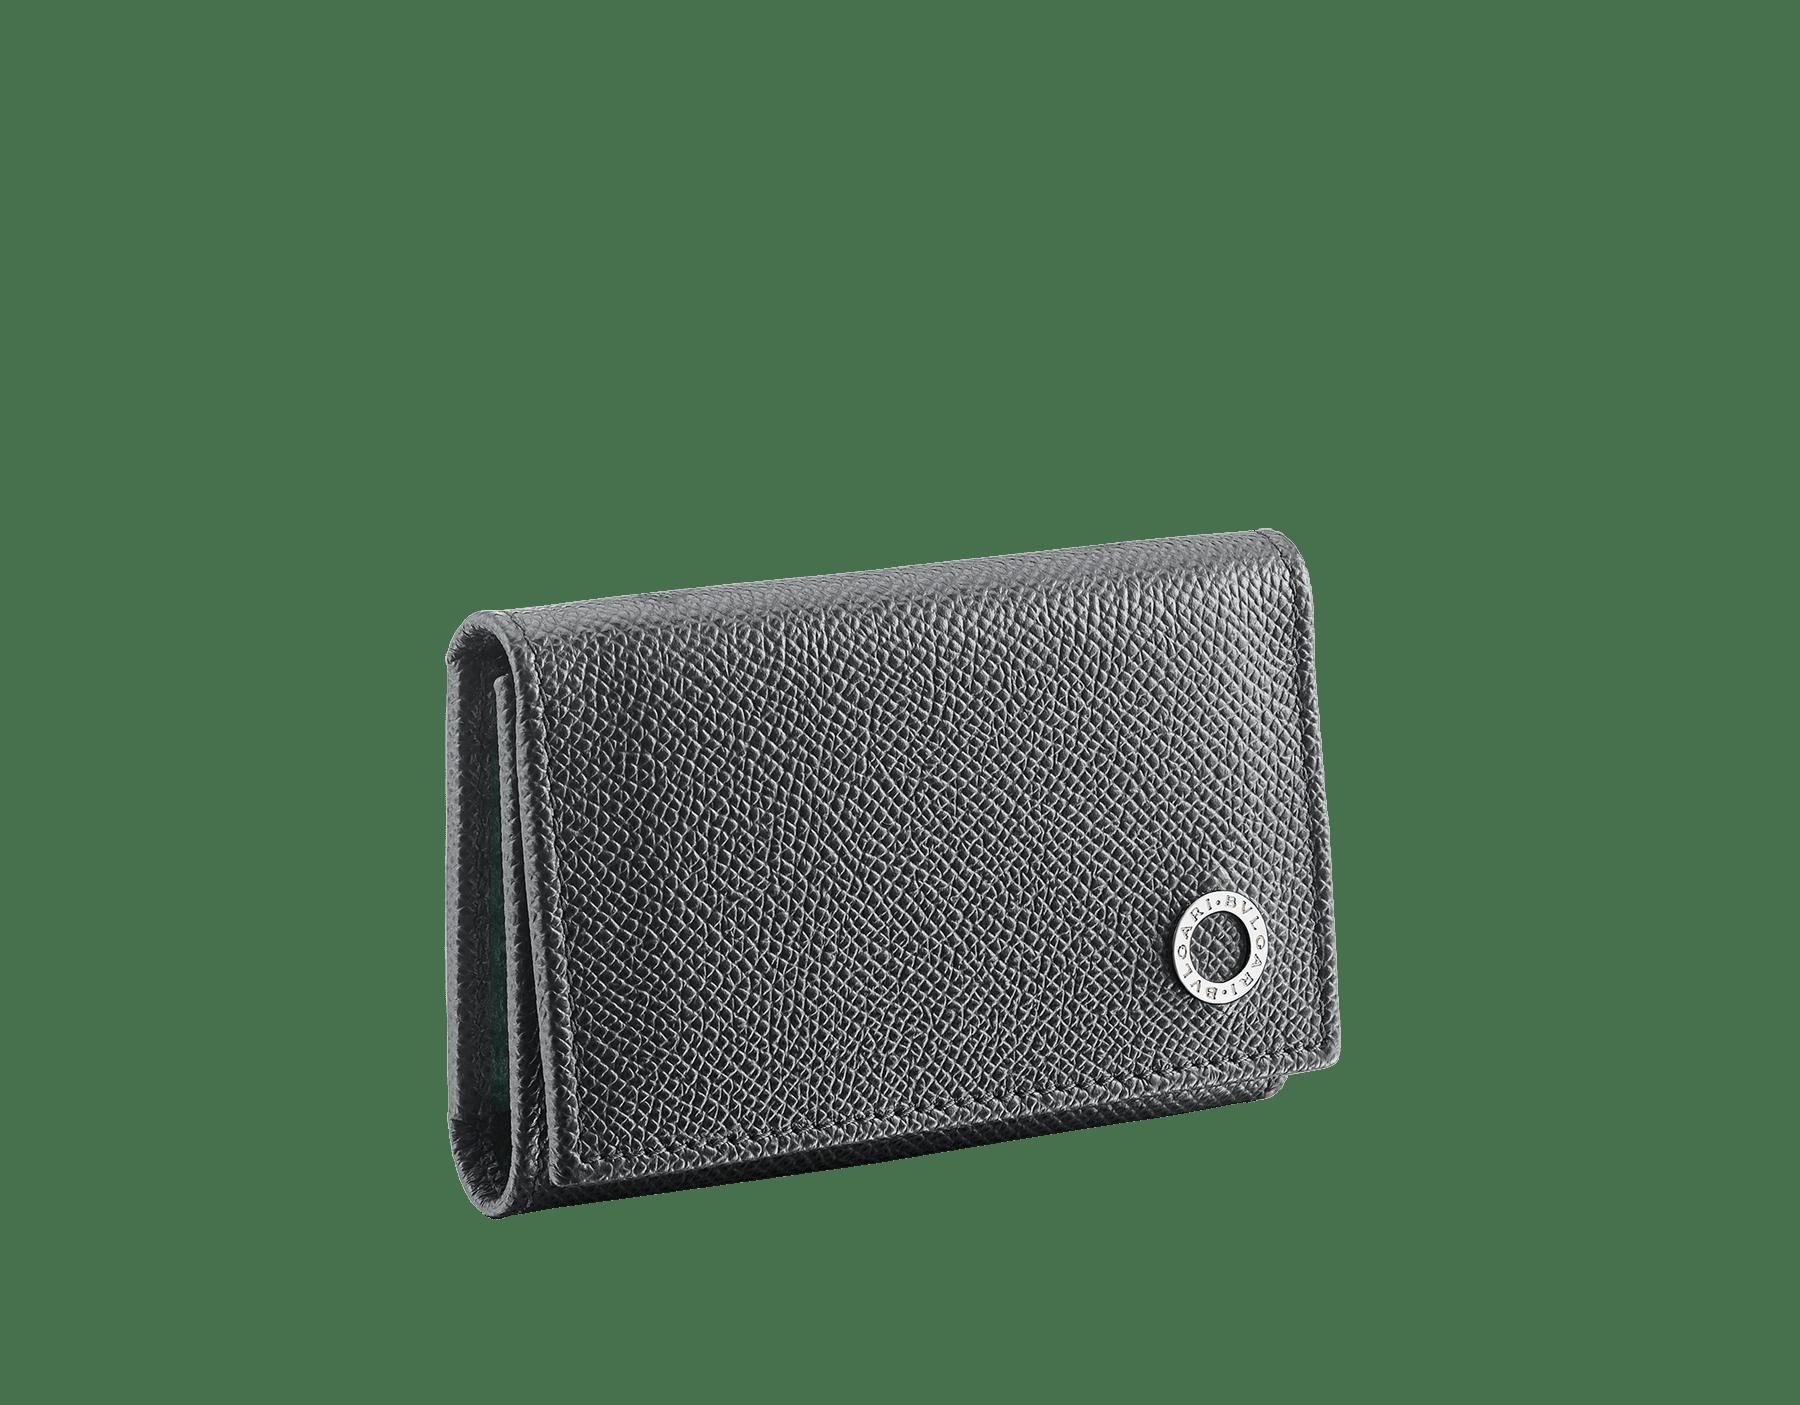 BVLGARI BVLGARI double key holder in denim sapphire grained calf leather. Detachable car key holder in palladium plated brass. BBM-DOUBLE-KEYHOLDa image 1